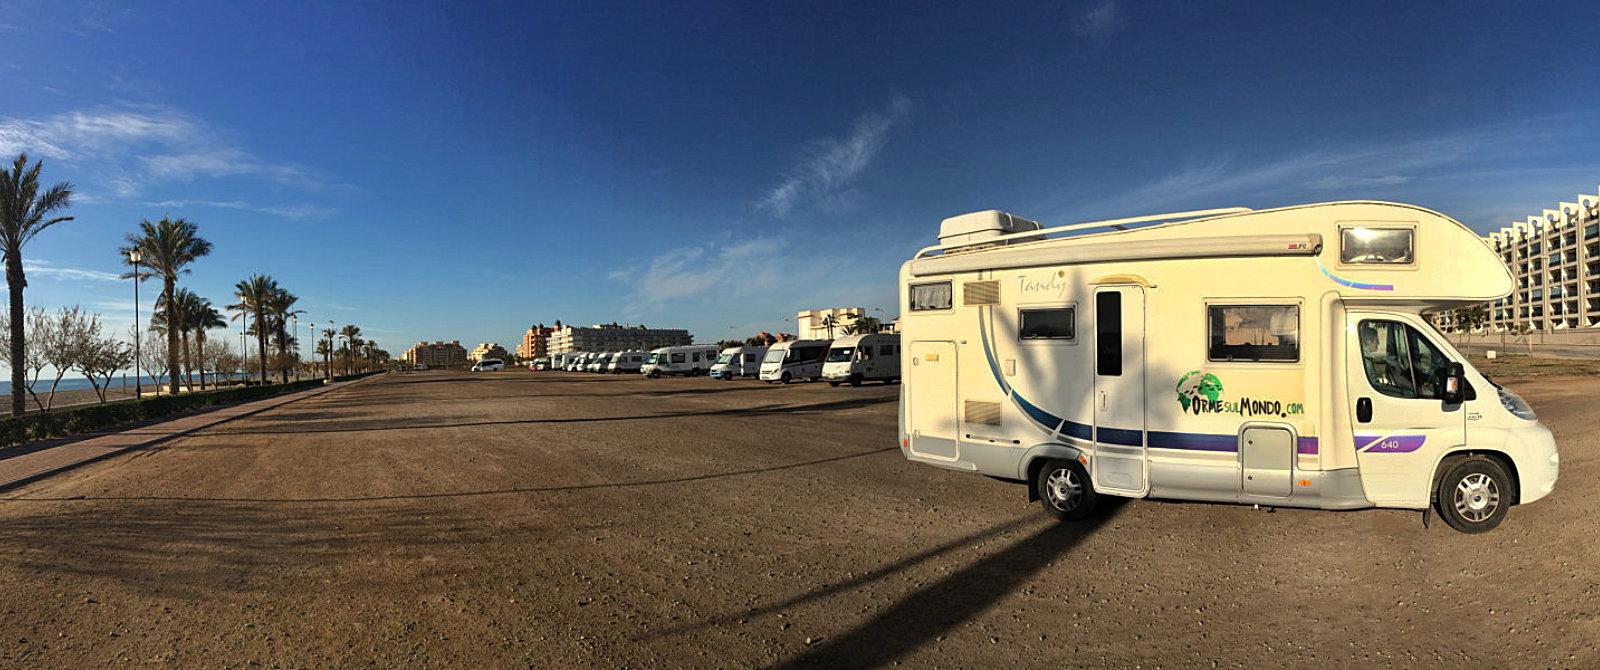 Sosta camper a Roquetas de Mar